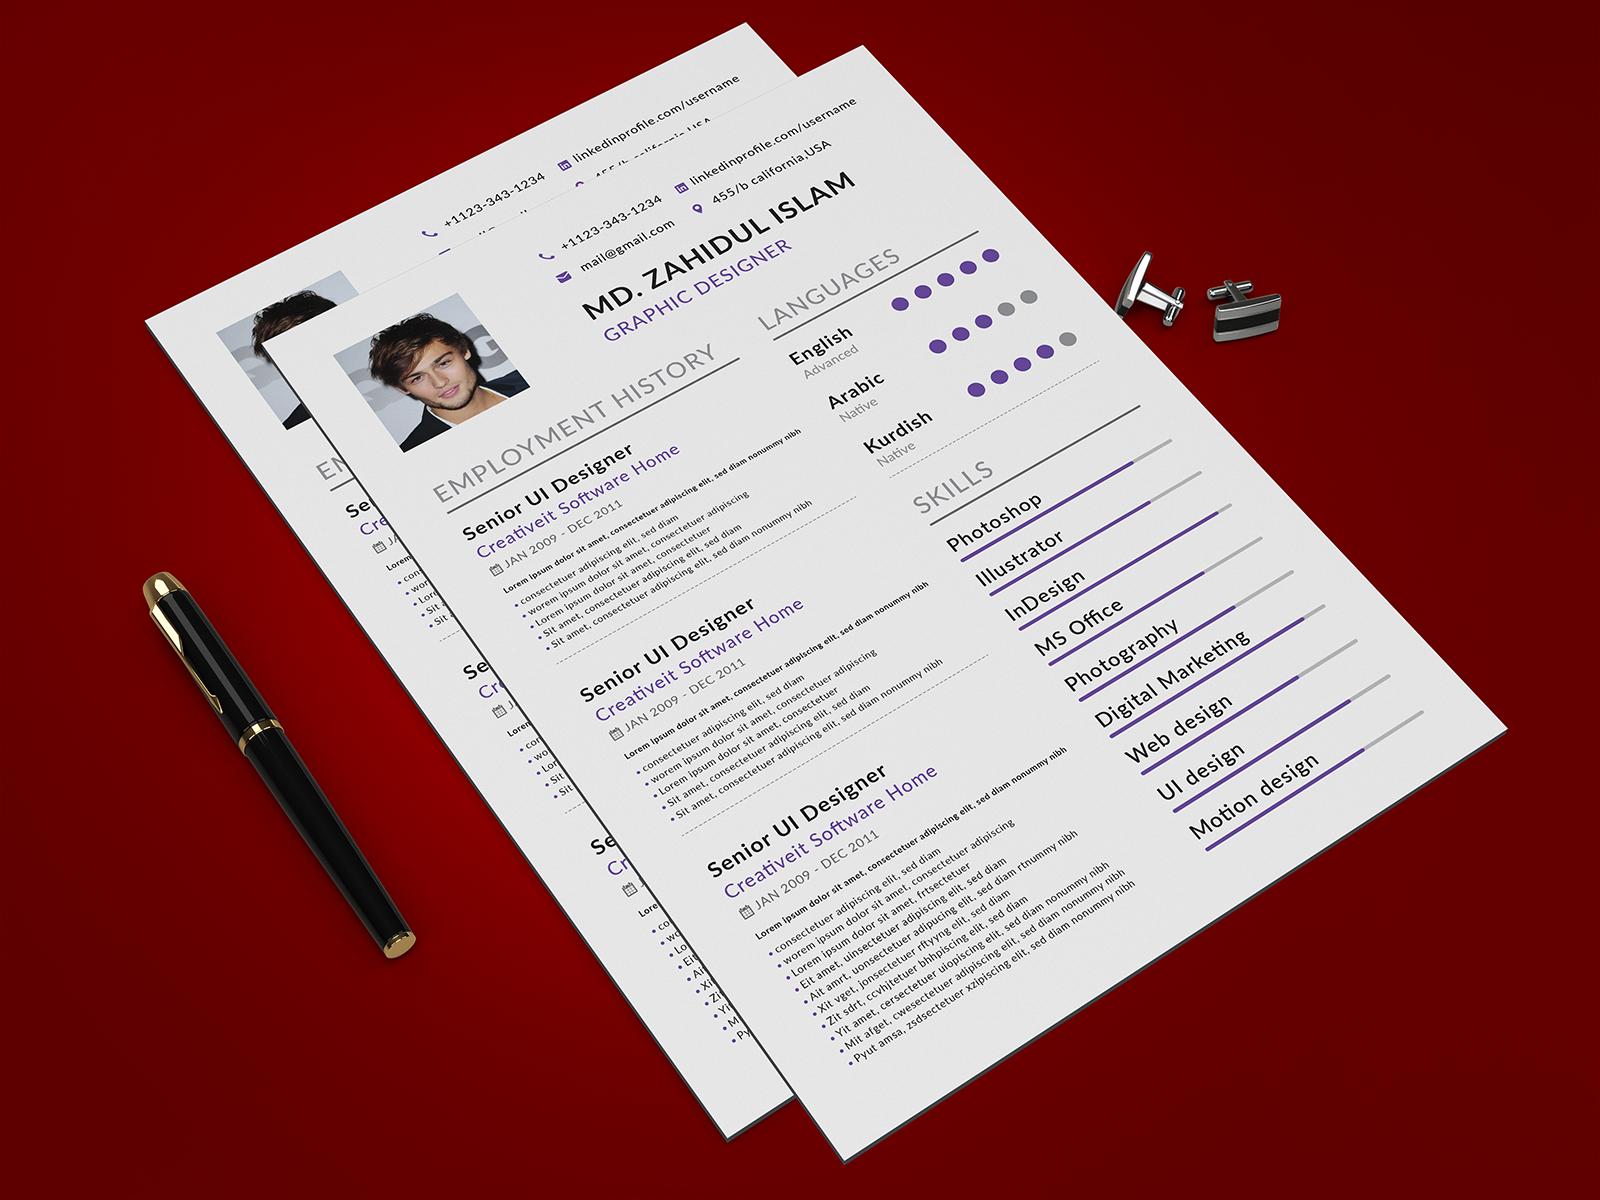 Professional Resume Cv Design By Md Zahidul Islam On Dribbble